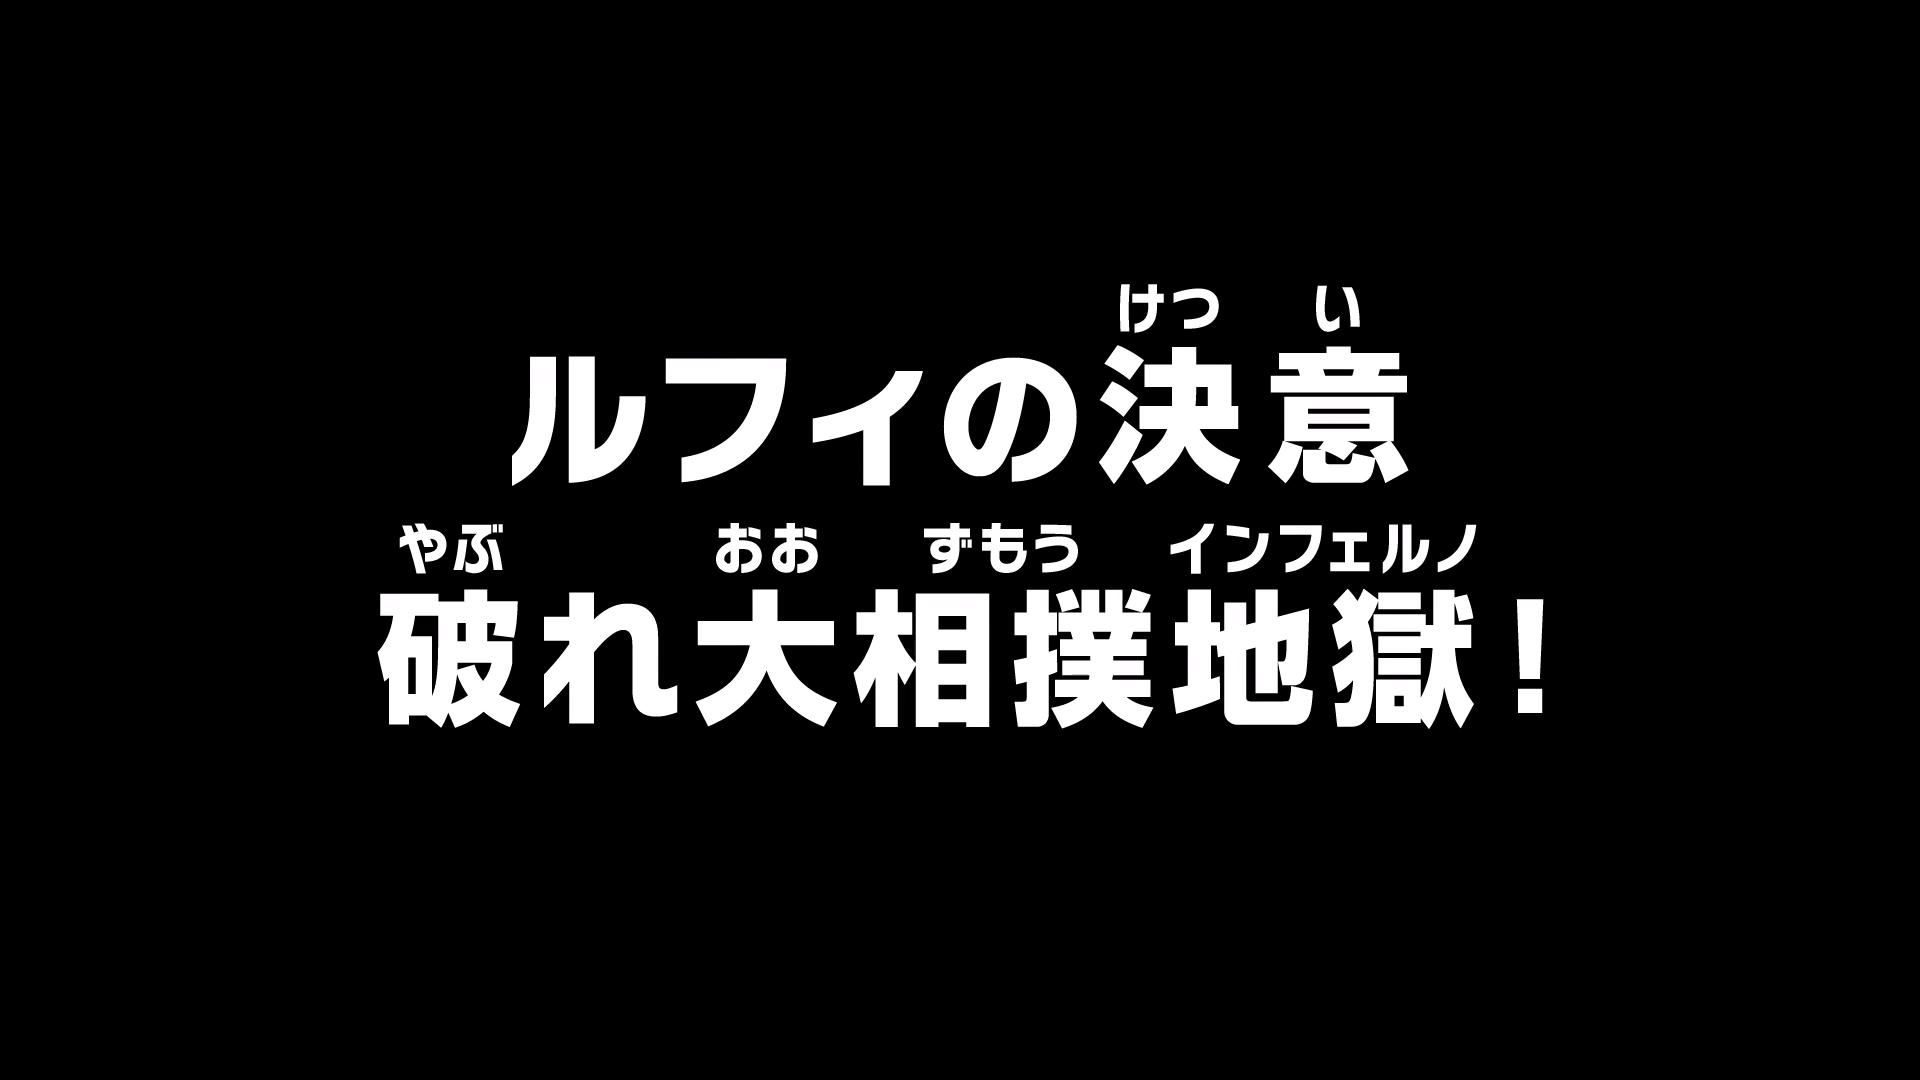 Episode 943